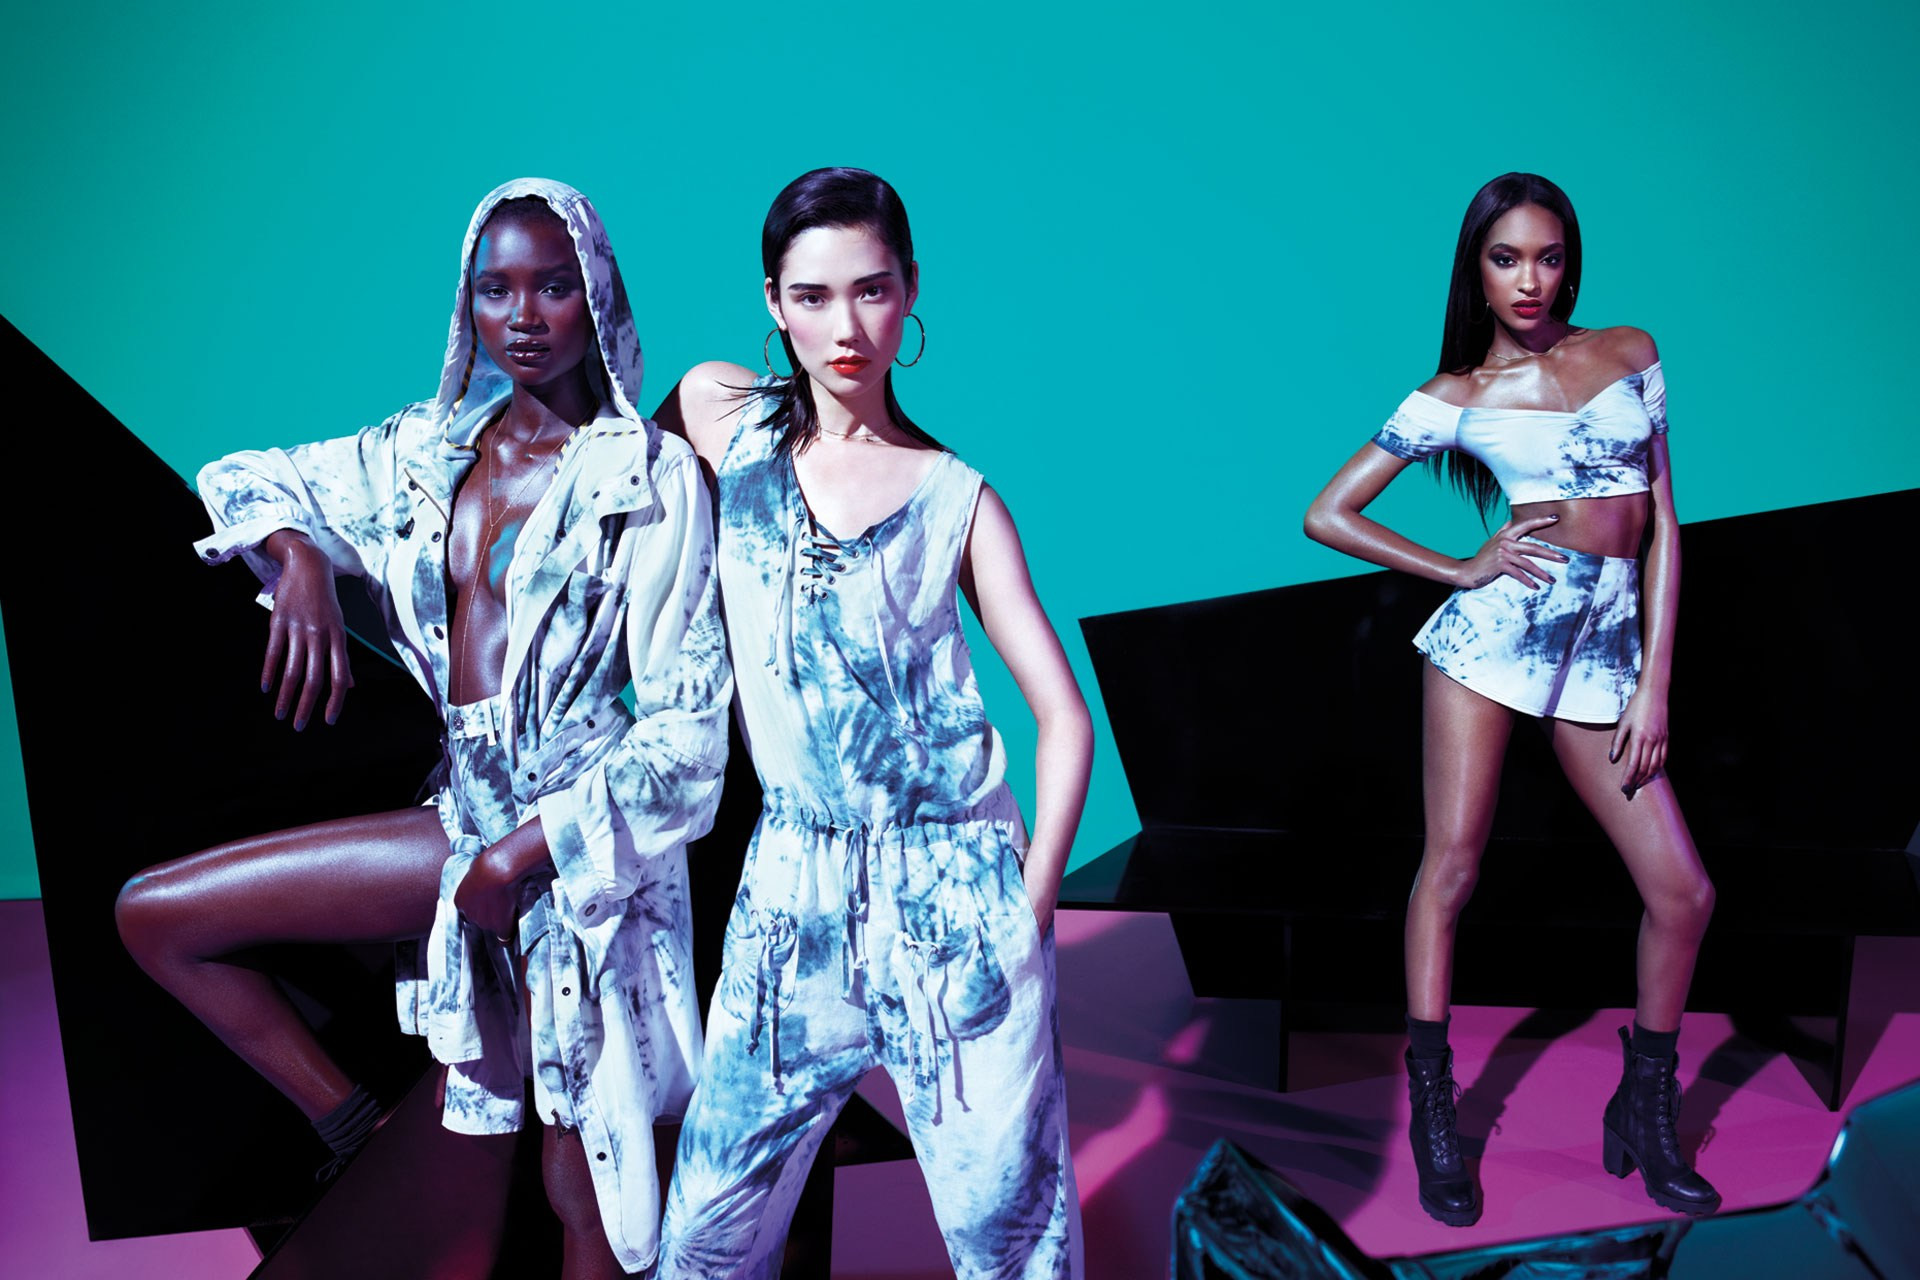 Jourdan Dunn, Tao Okamoto, Bambi Northwood-Blyth and Ataui Deng Star in Rihanna for River Island Summer 2013 Campaign